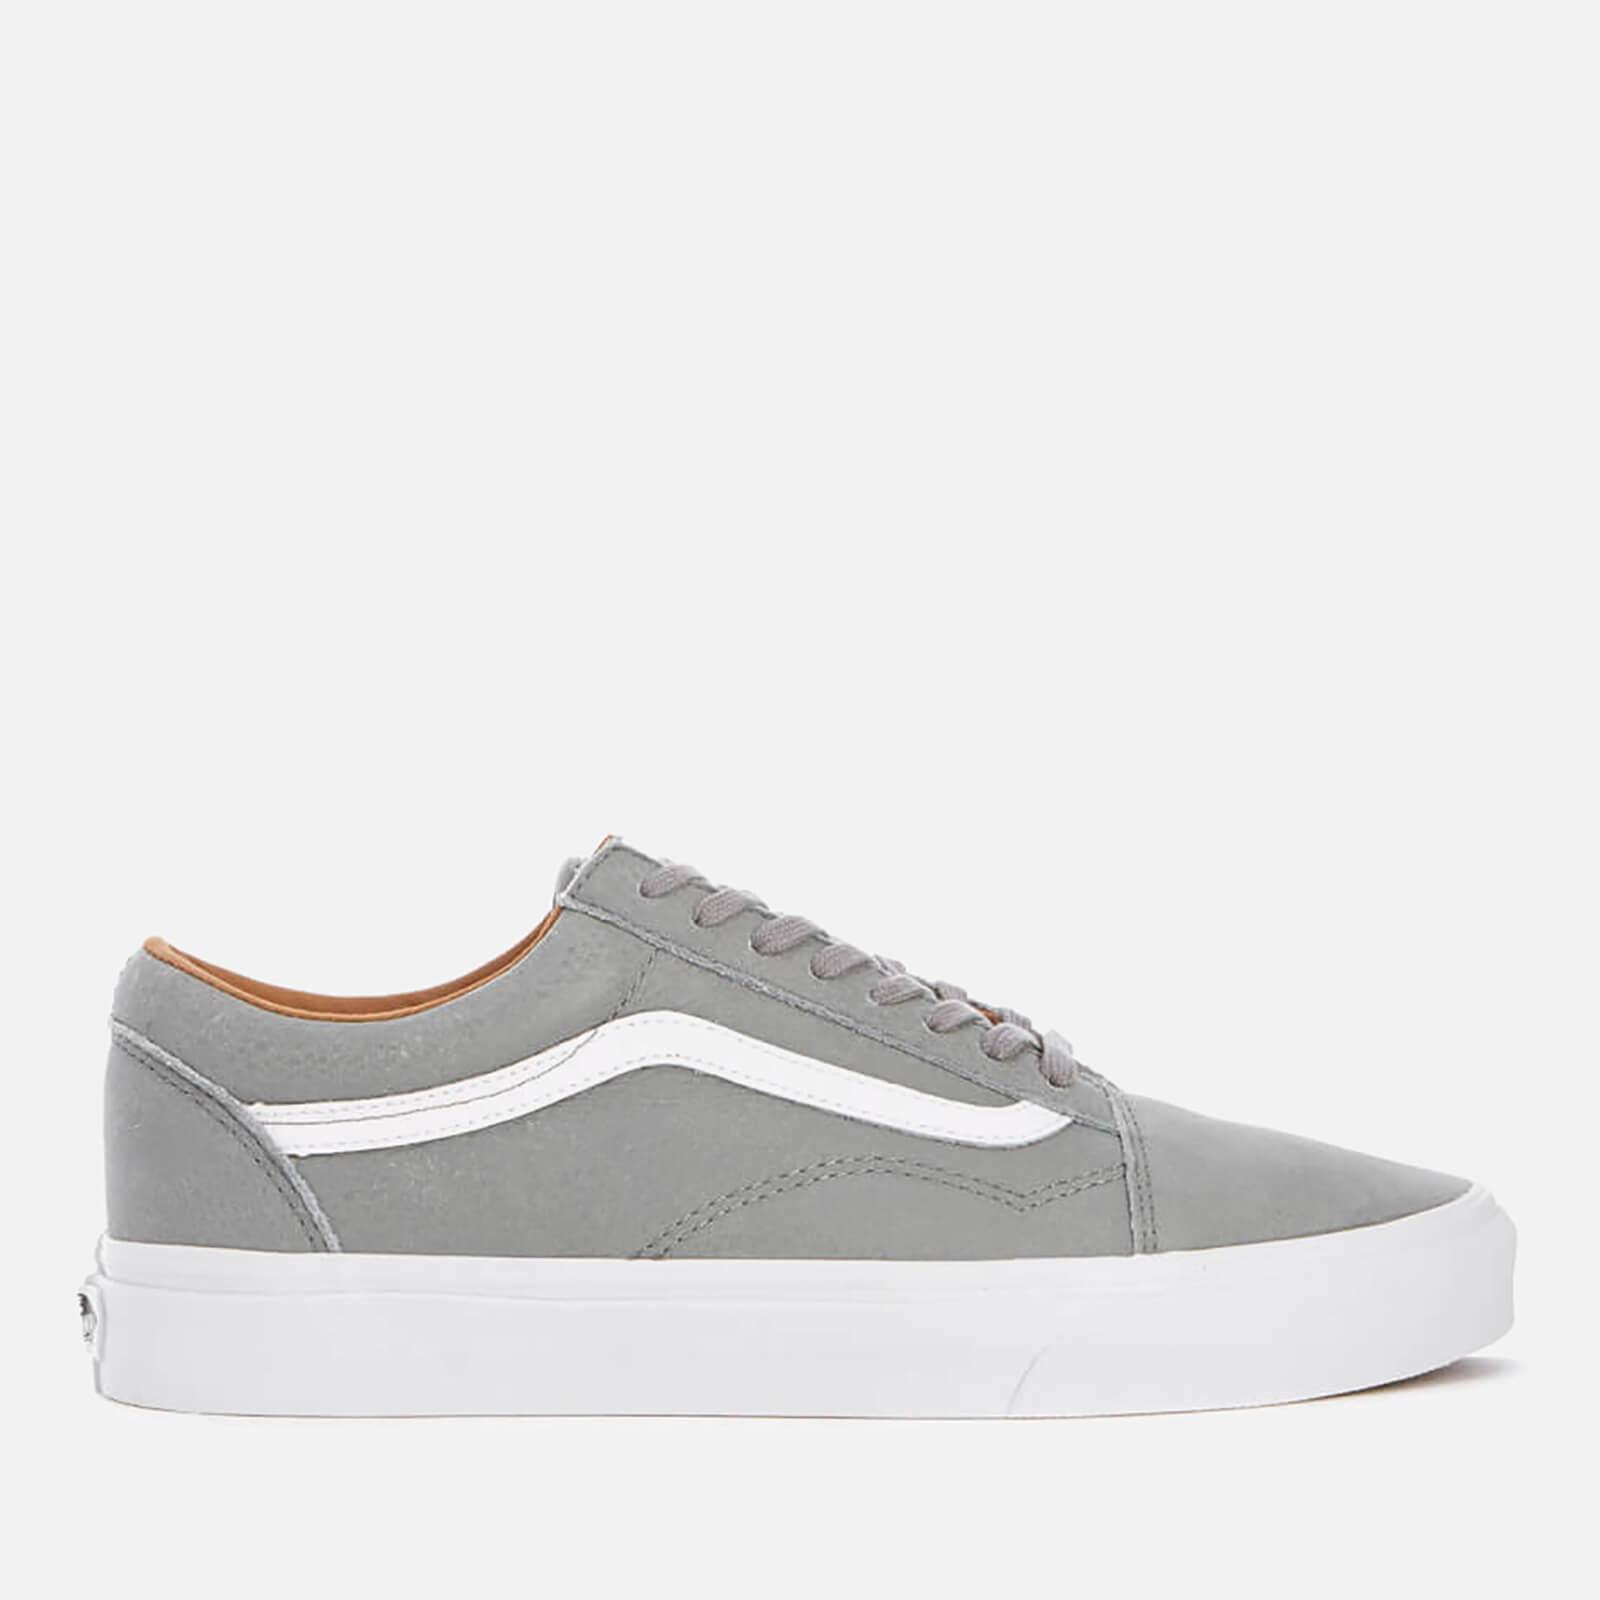 85fb6968ee8c Vans Men s Old Skool Premium Leather Trainers - Wild Dove True White Mens  Footwear